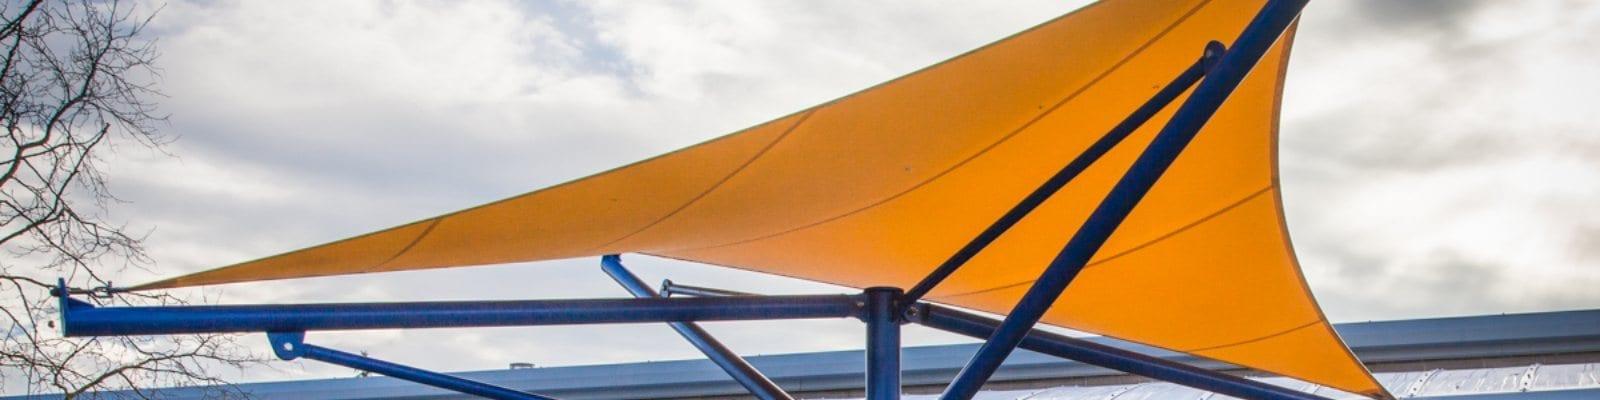 Fabric yellow canopy we designed for Paulton Junior School